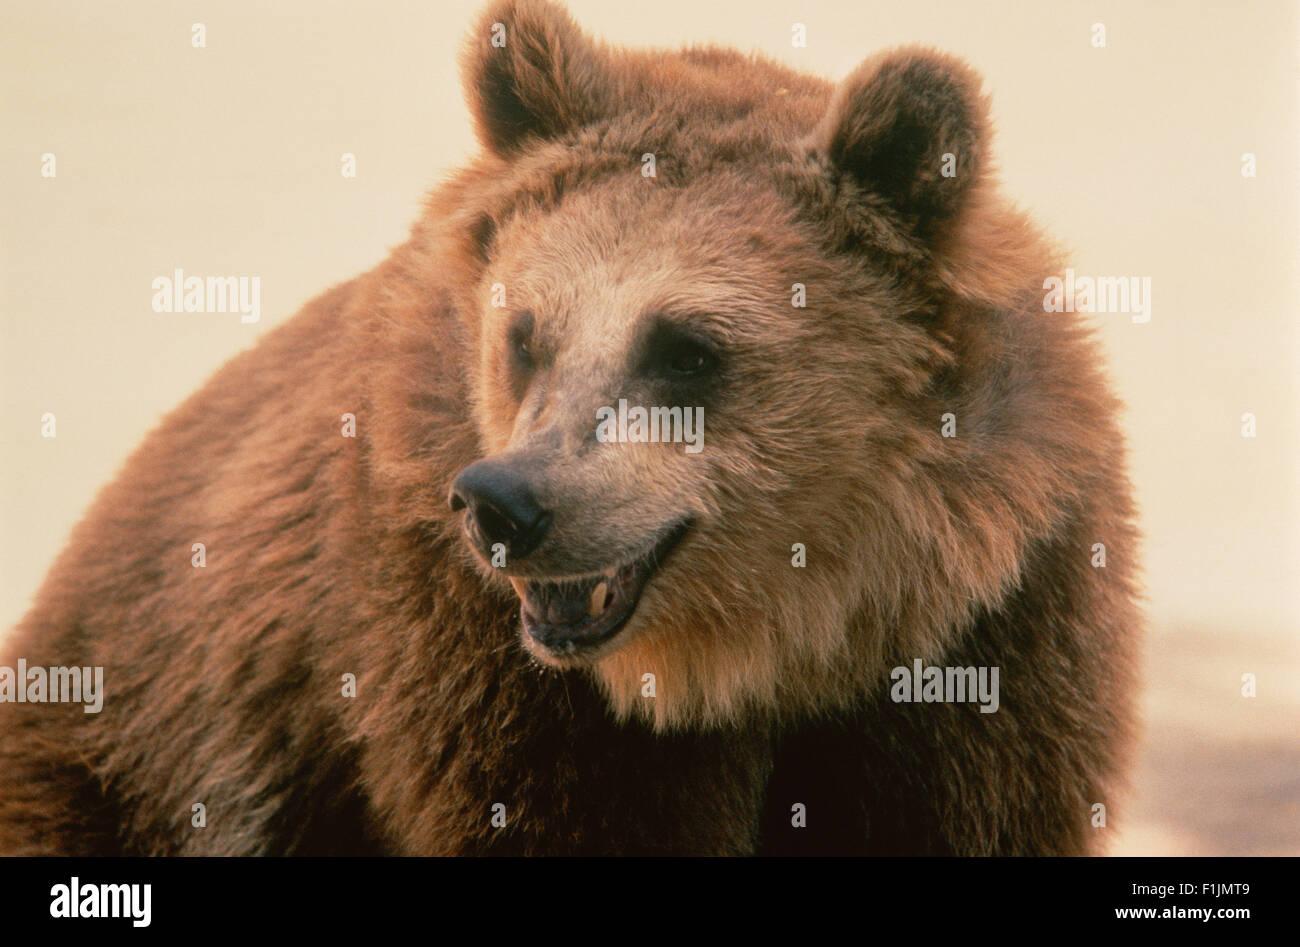 Growling Bear - Stock Image